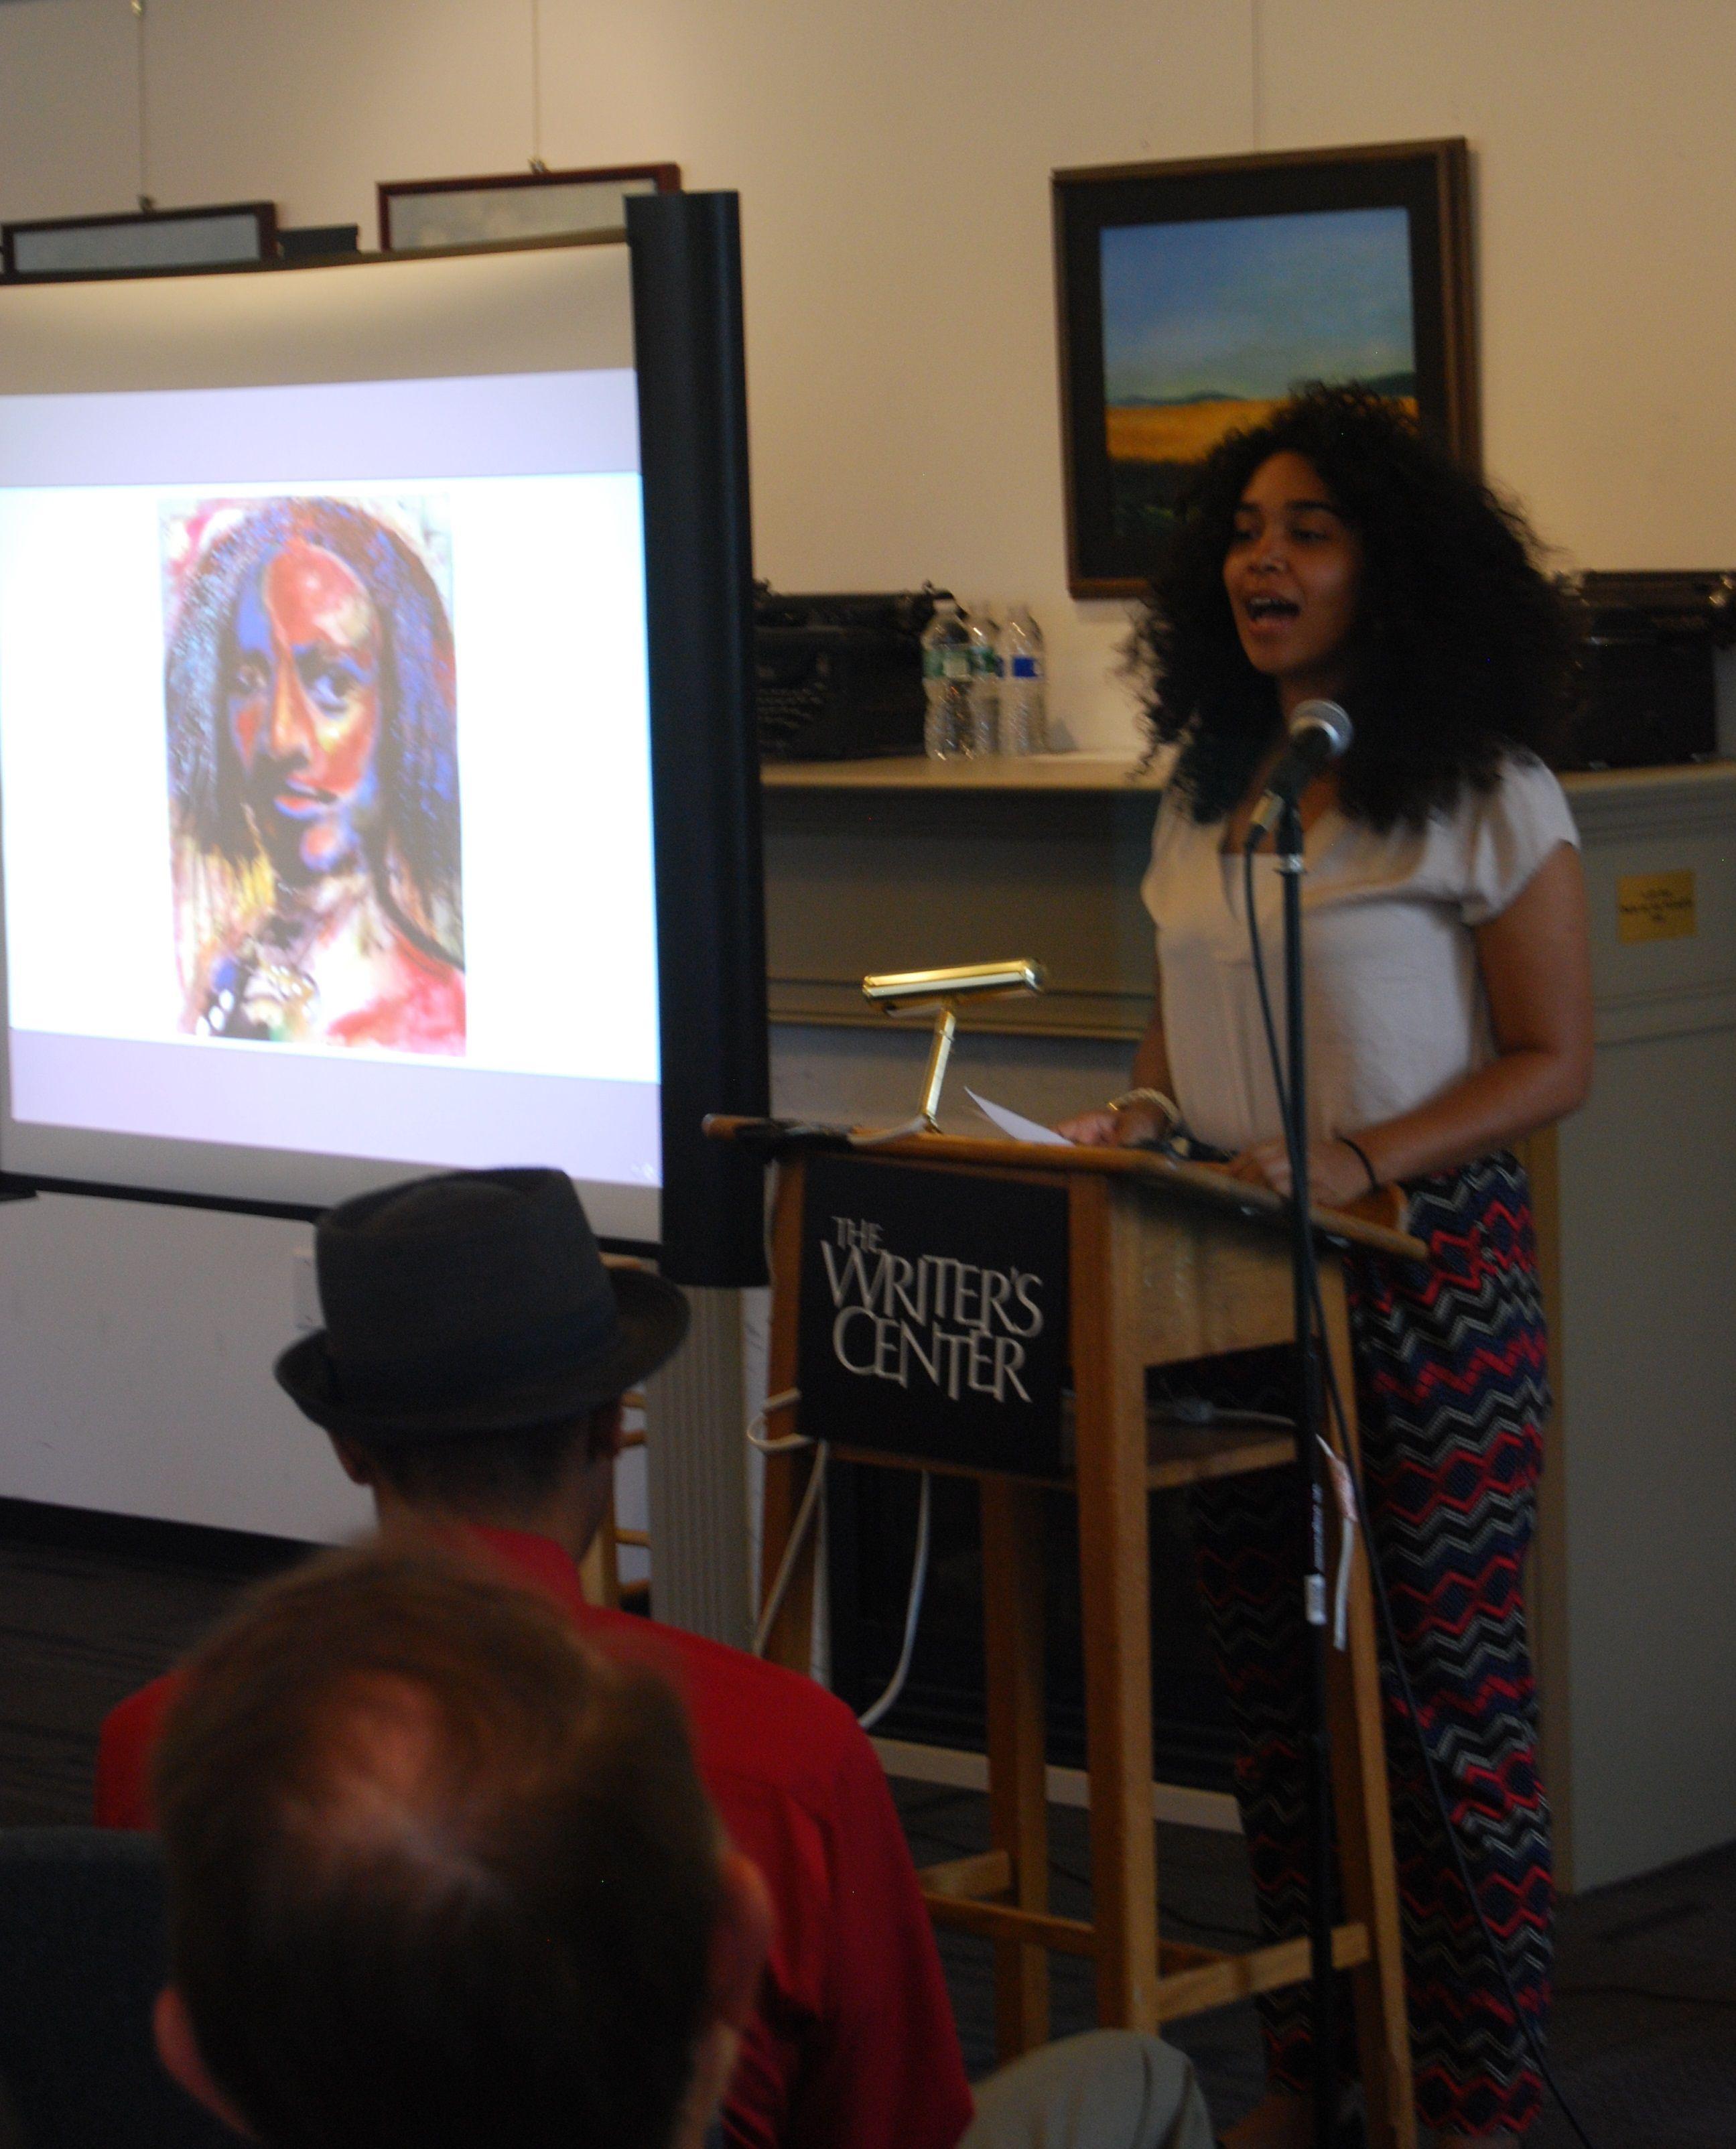 D.C. #poet Elizabeth Acevedo reads at #PoetLore 126th birthday event.